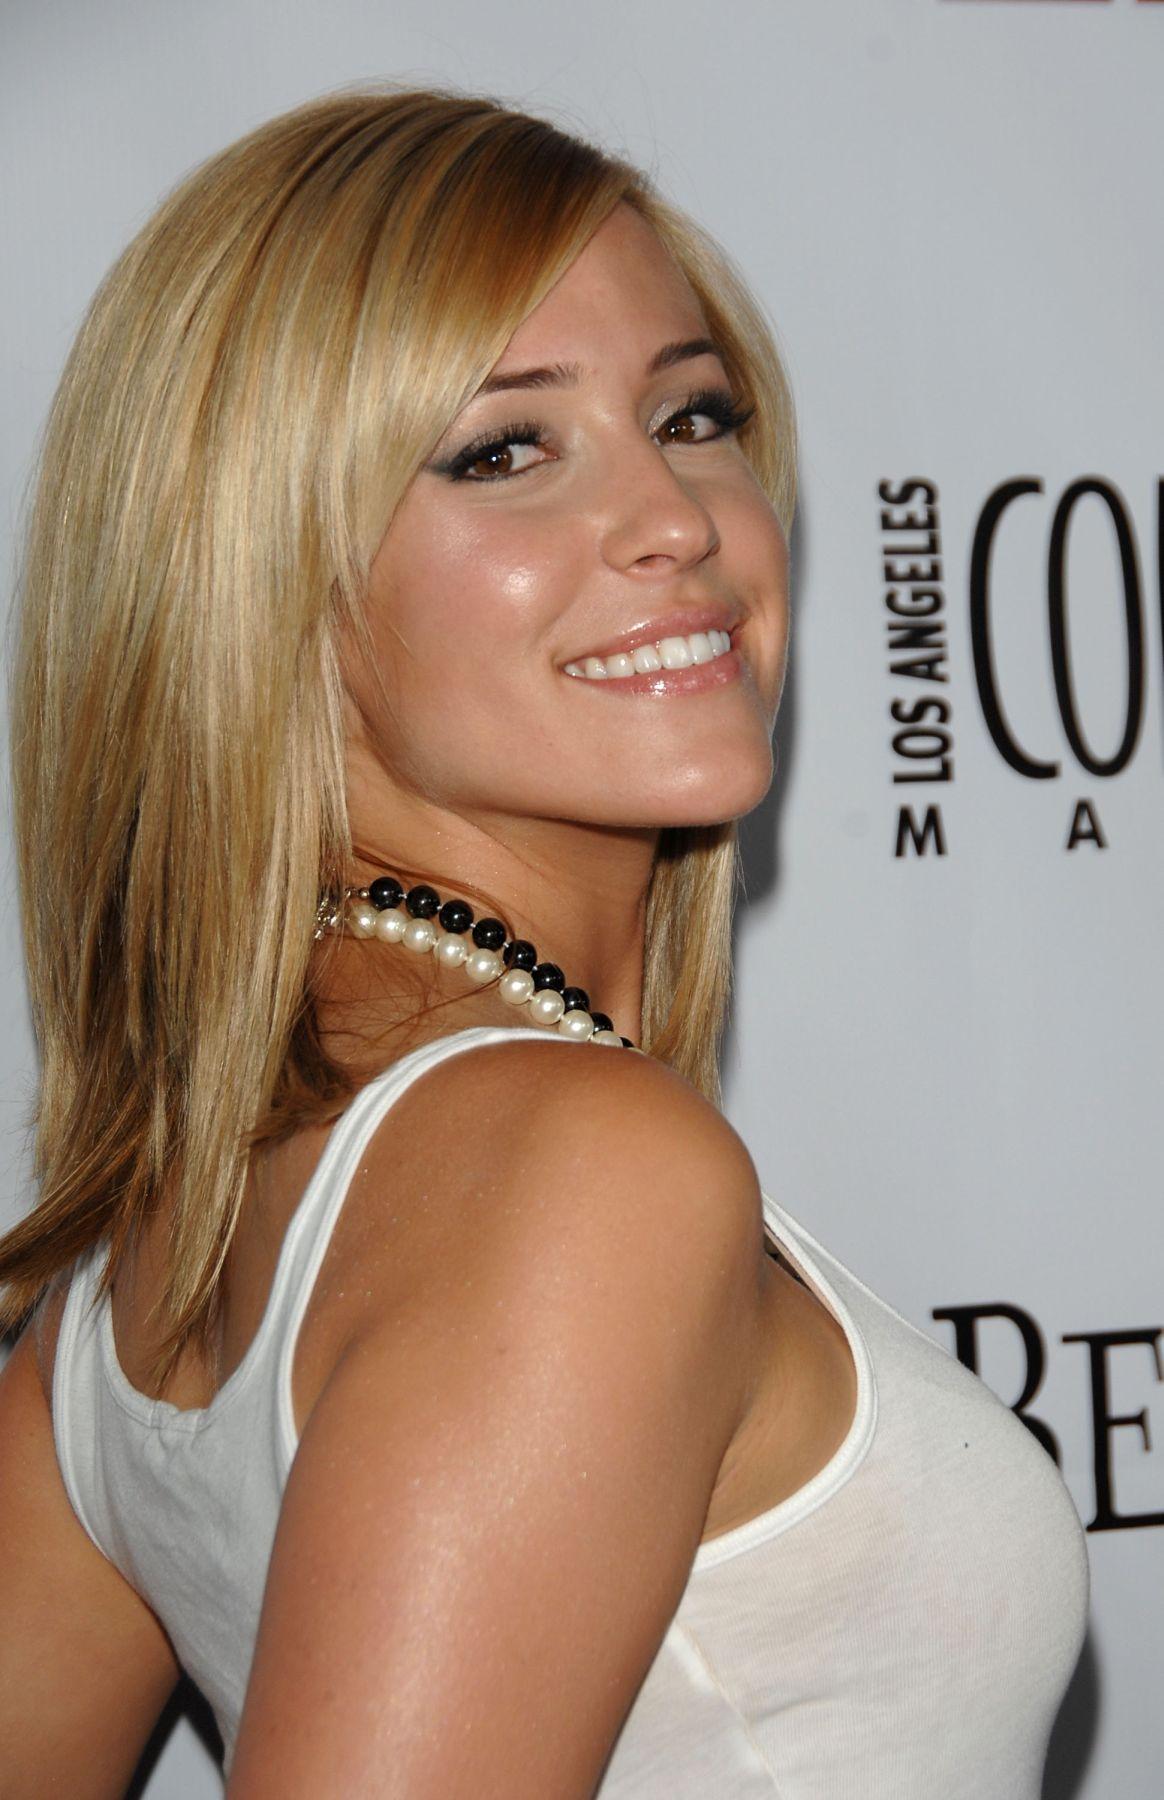 19 Kristin Cavallari (Jay Cutler) - NFL WAGs 2013